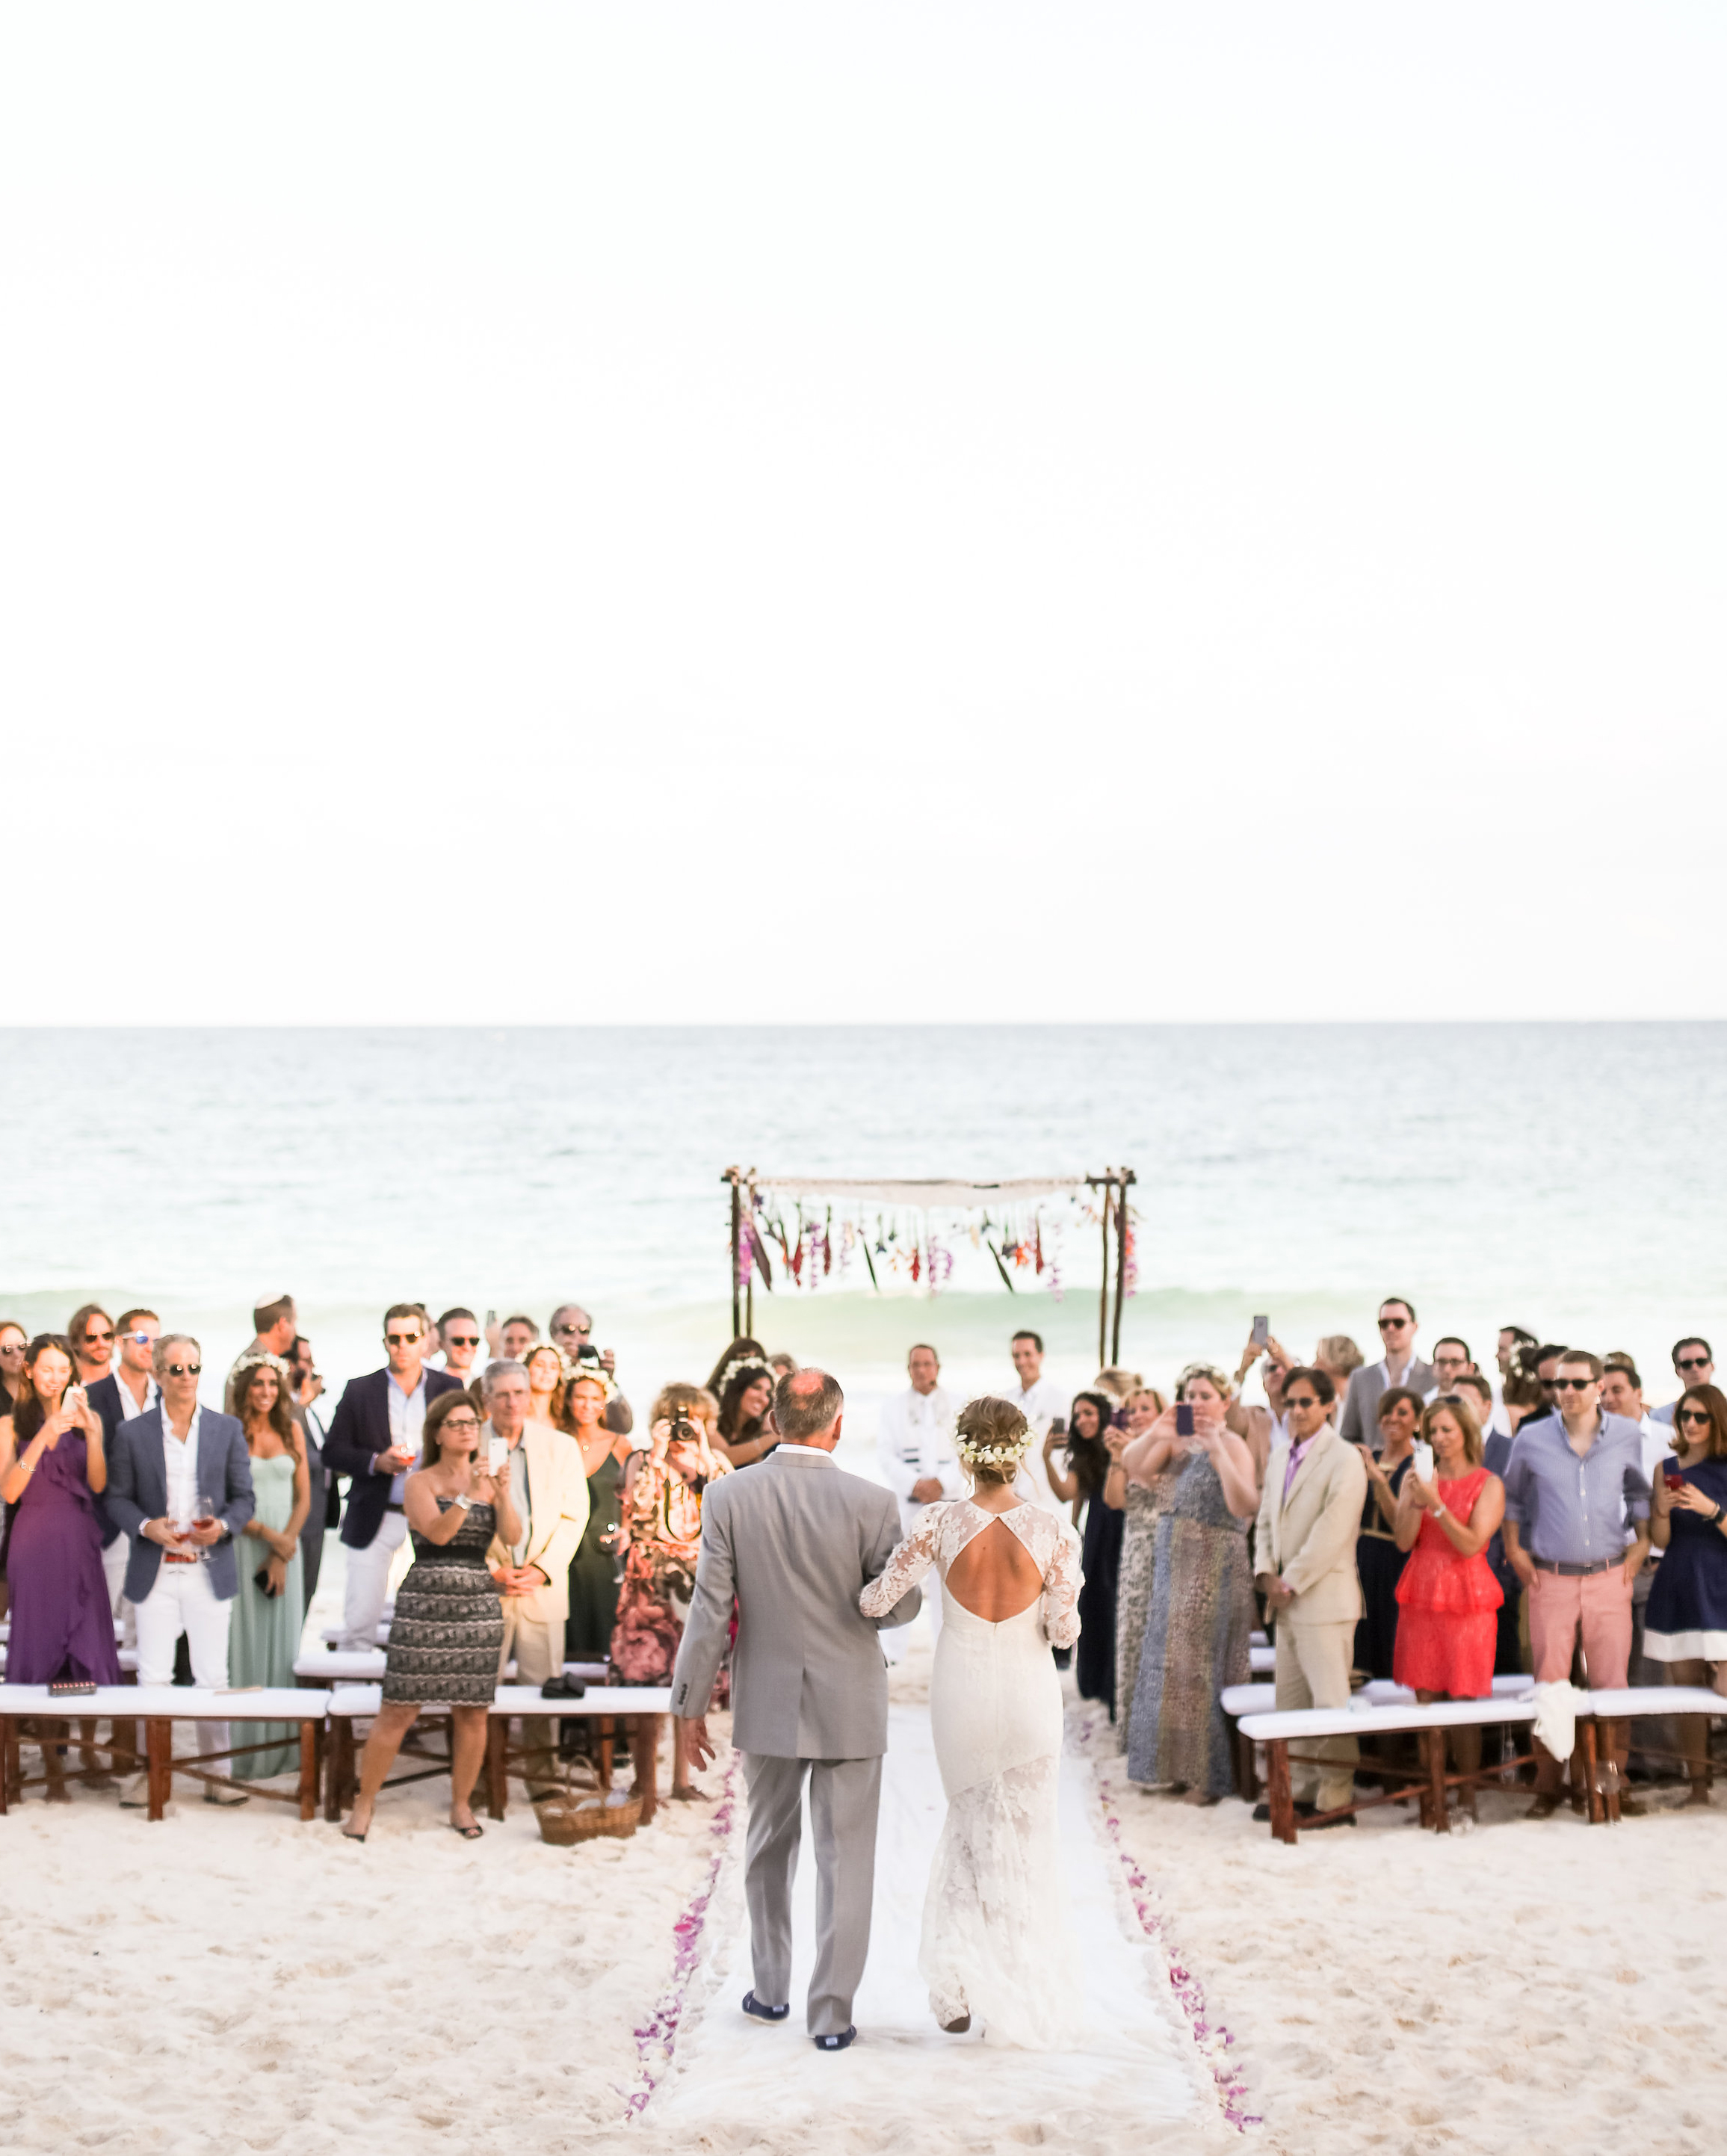 olivia-keith-wedding-ceremony-36-s112304-0815.jpg